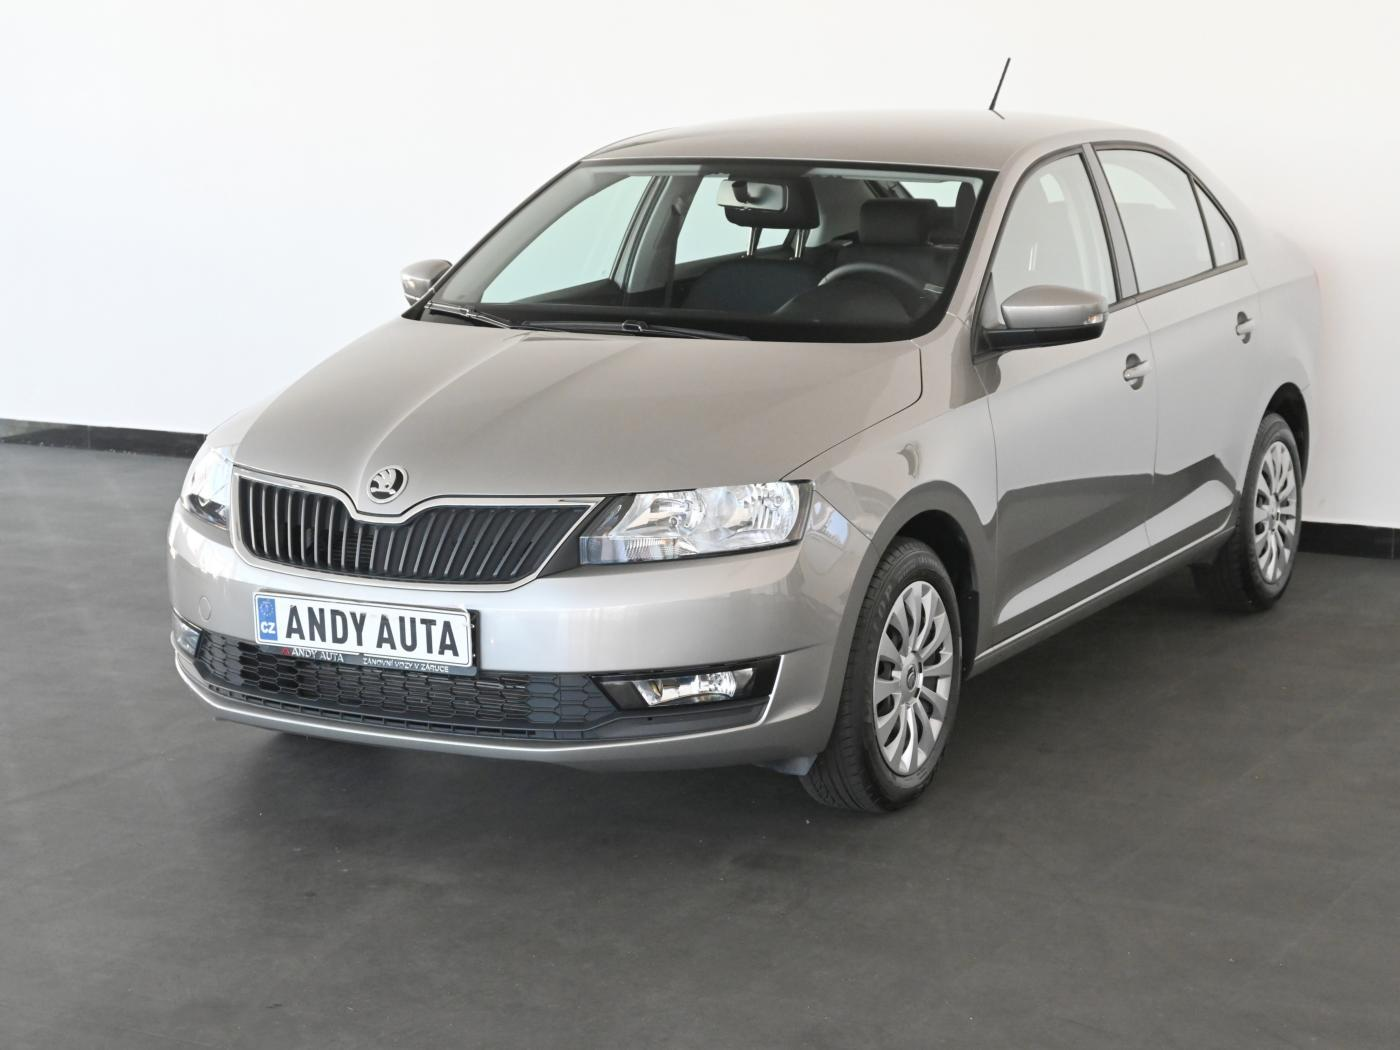 Škoda Rapid 1.0 TSI KLIMA Záruka až 4 roky liftback